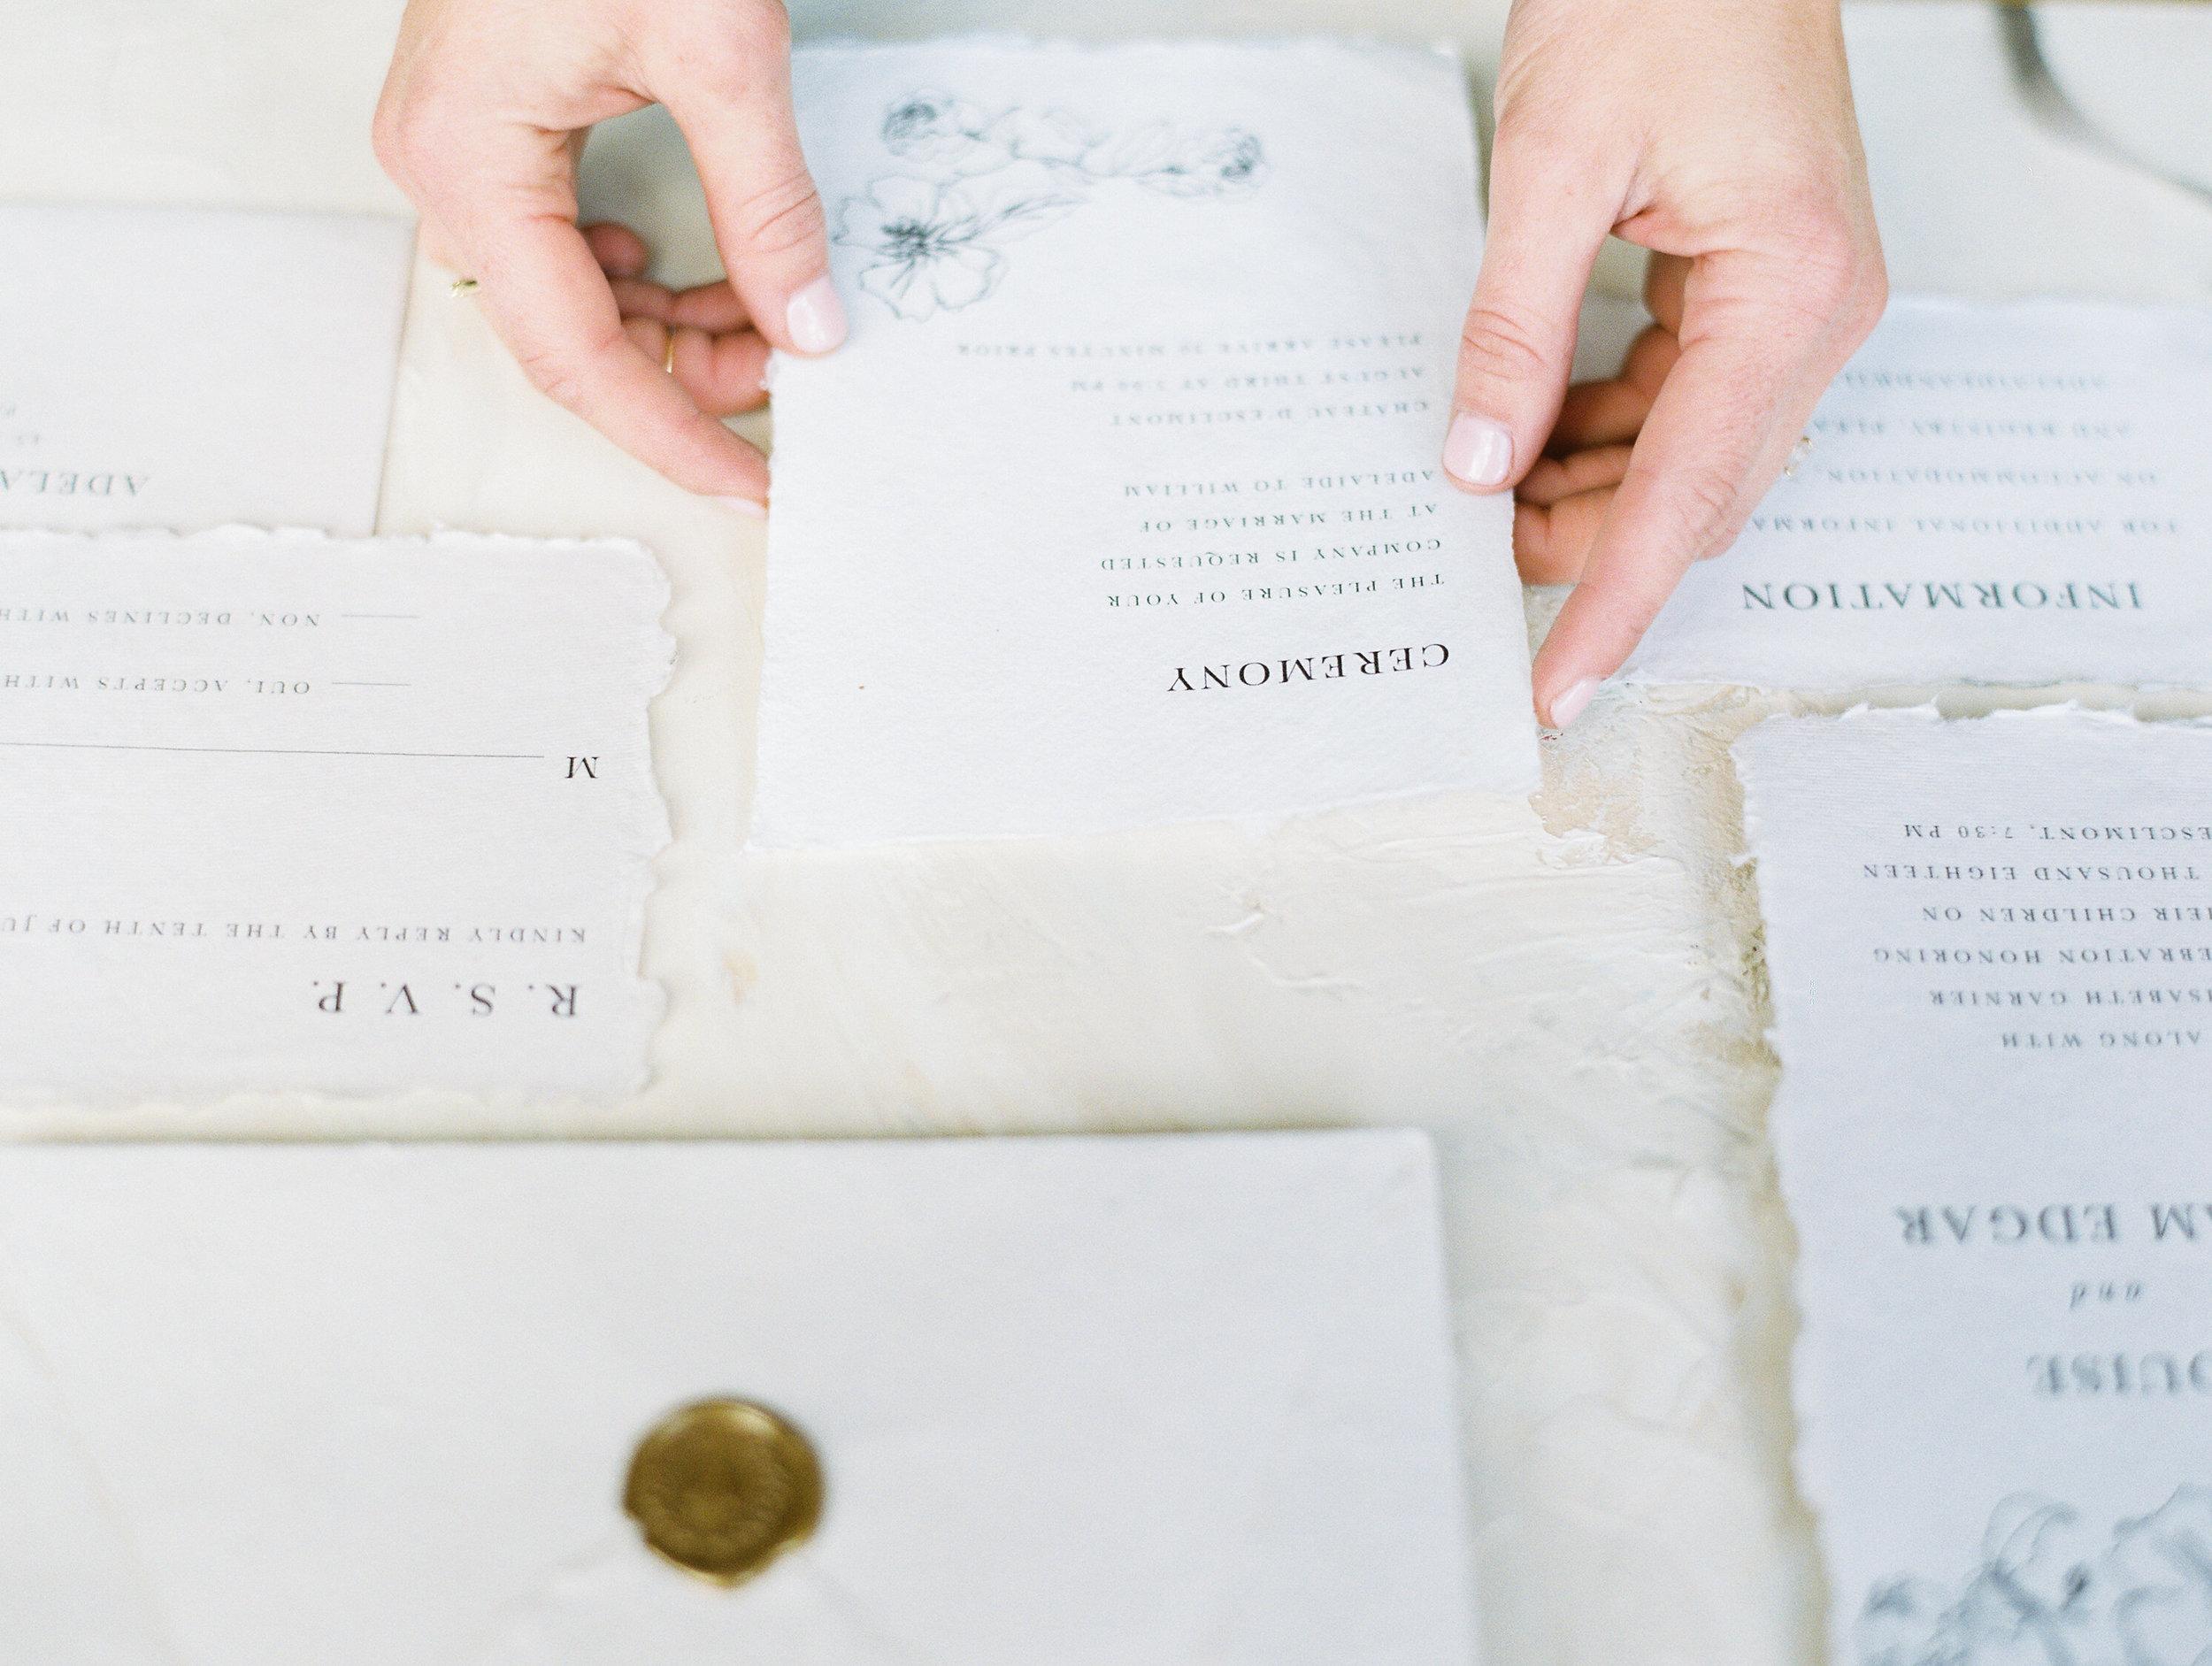 ink&pressco-mikylamanu-wedding-calligraphy-3-unearthing.tc.jpg